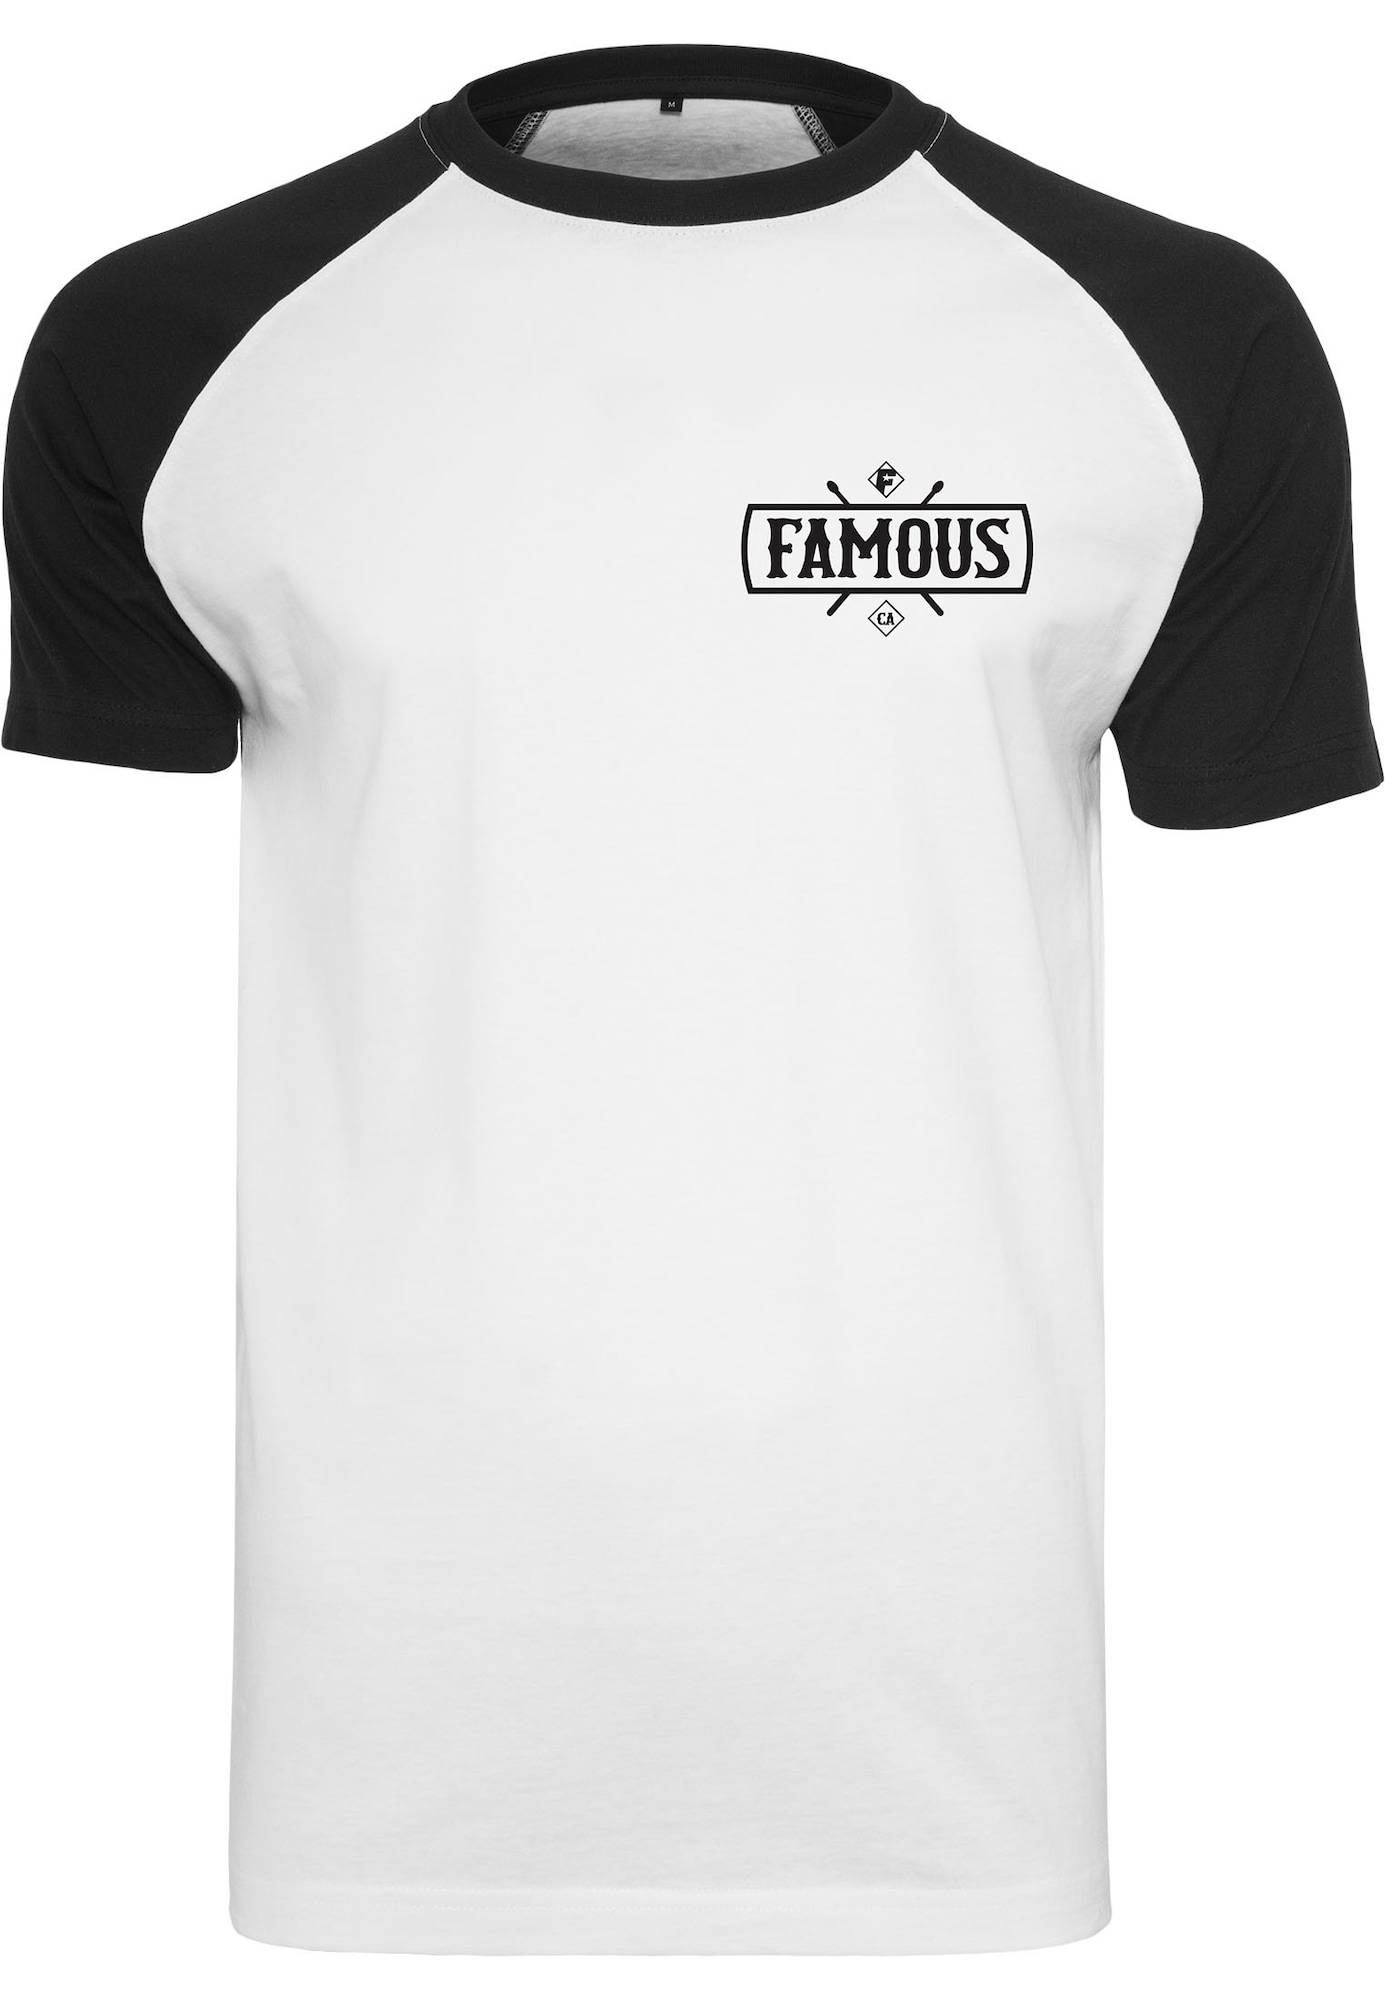 Tee T-Shirt 'Chaos'  - Blanc - Taille: XL - male